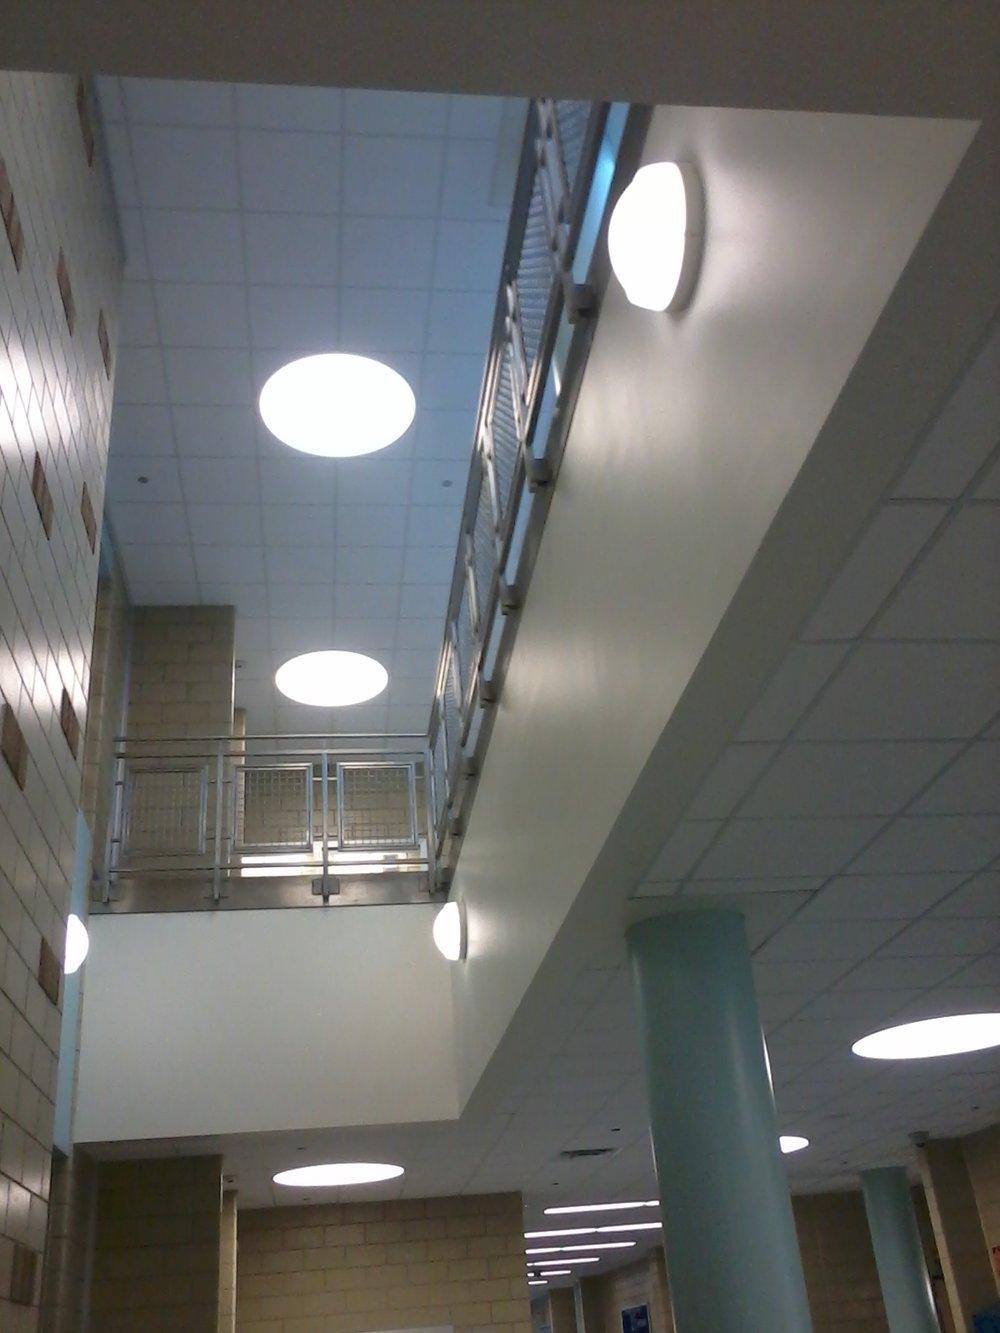 Sauganash Elementary School Balcony.jpg